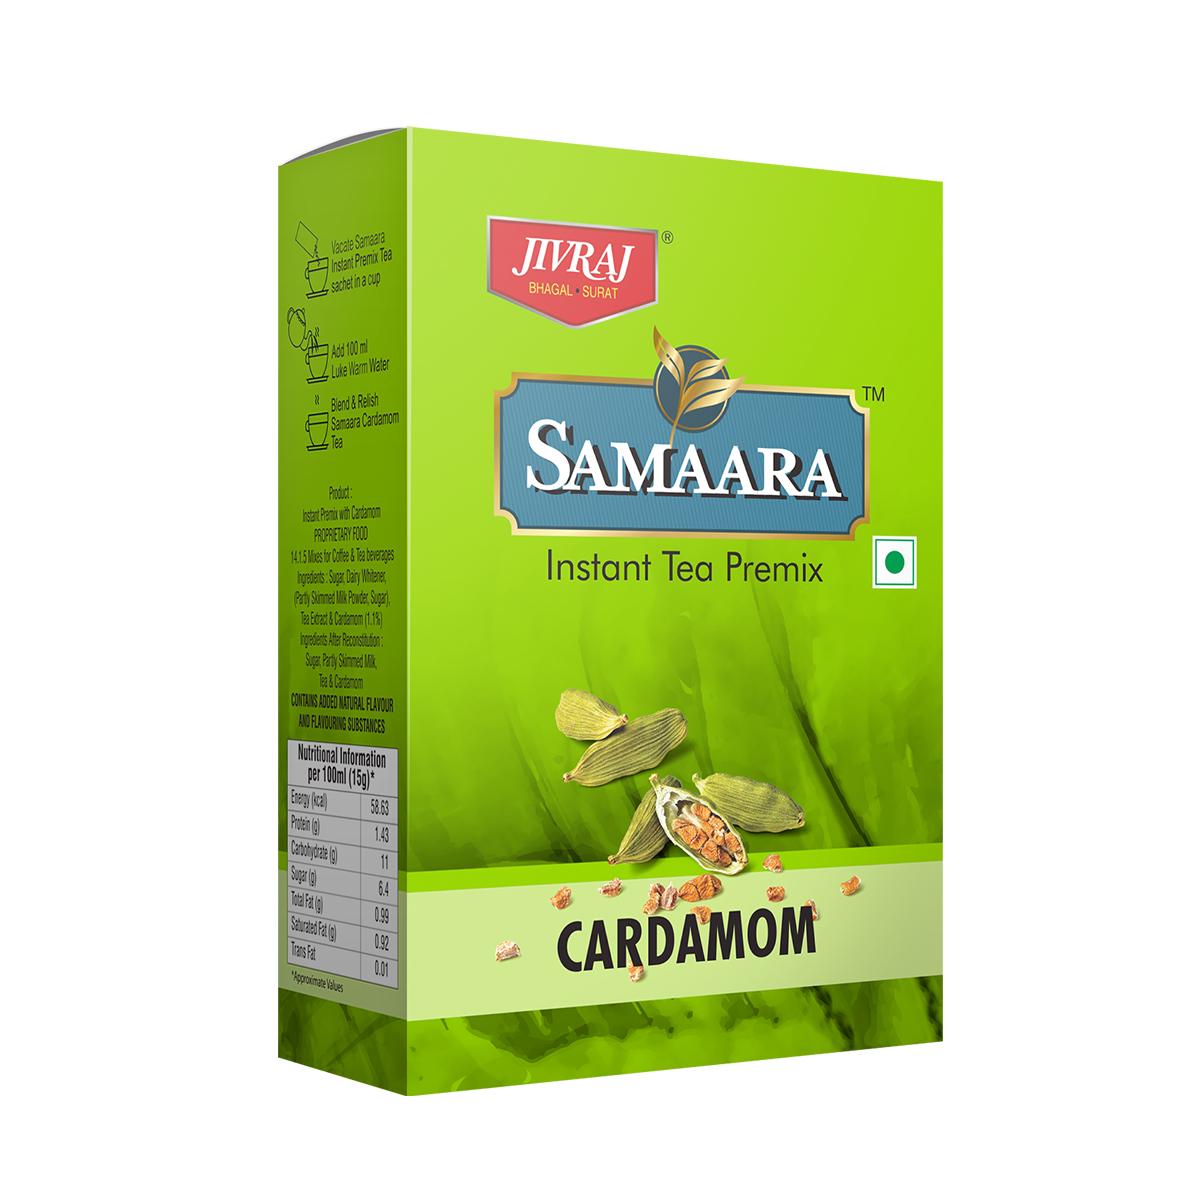 Samaara Tea from Jivraj Family Enters the Domestic Market